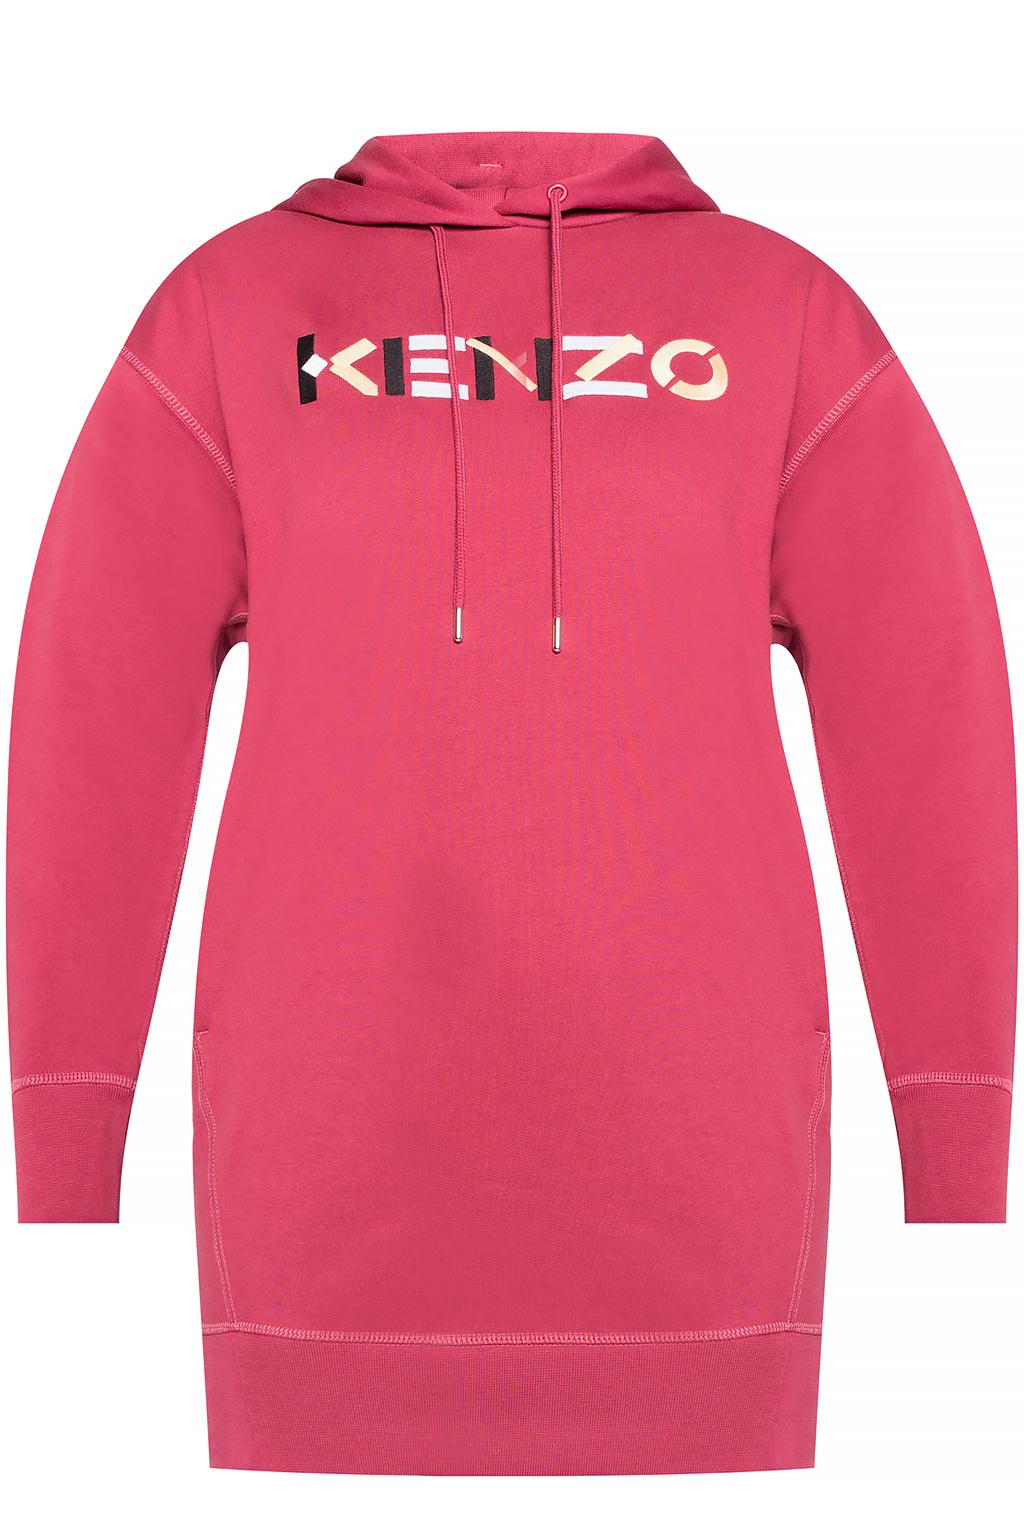 Kenzo Long hoodie with logo